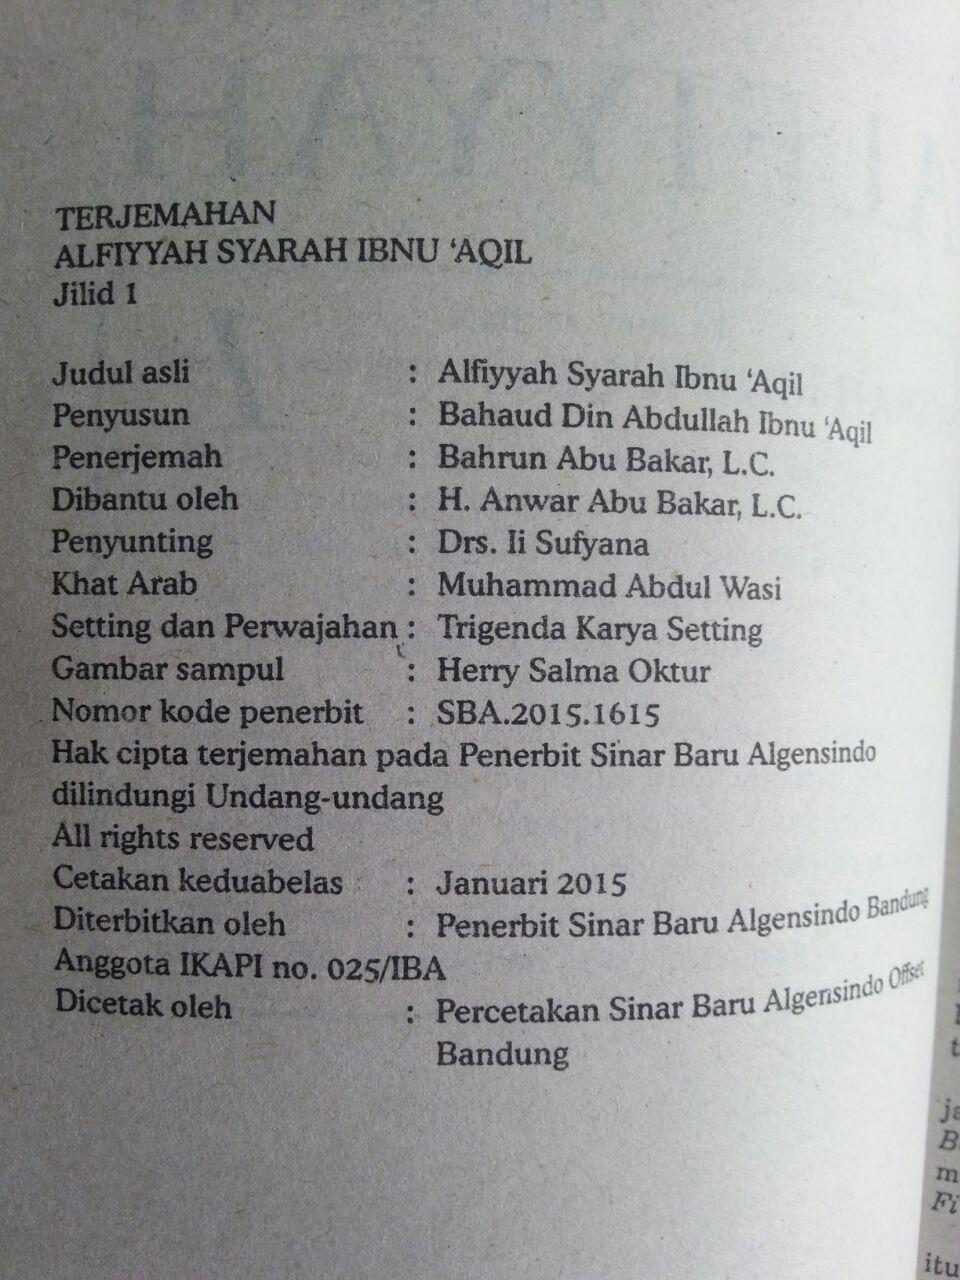 Buku Terjemahan Alfiyyah Syarah Ibnu Aqil Soft Cover Set 2 Jilid isi 2